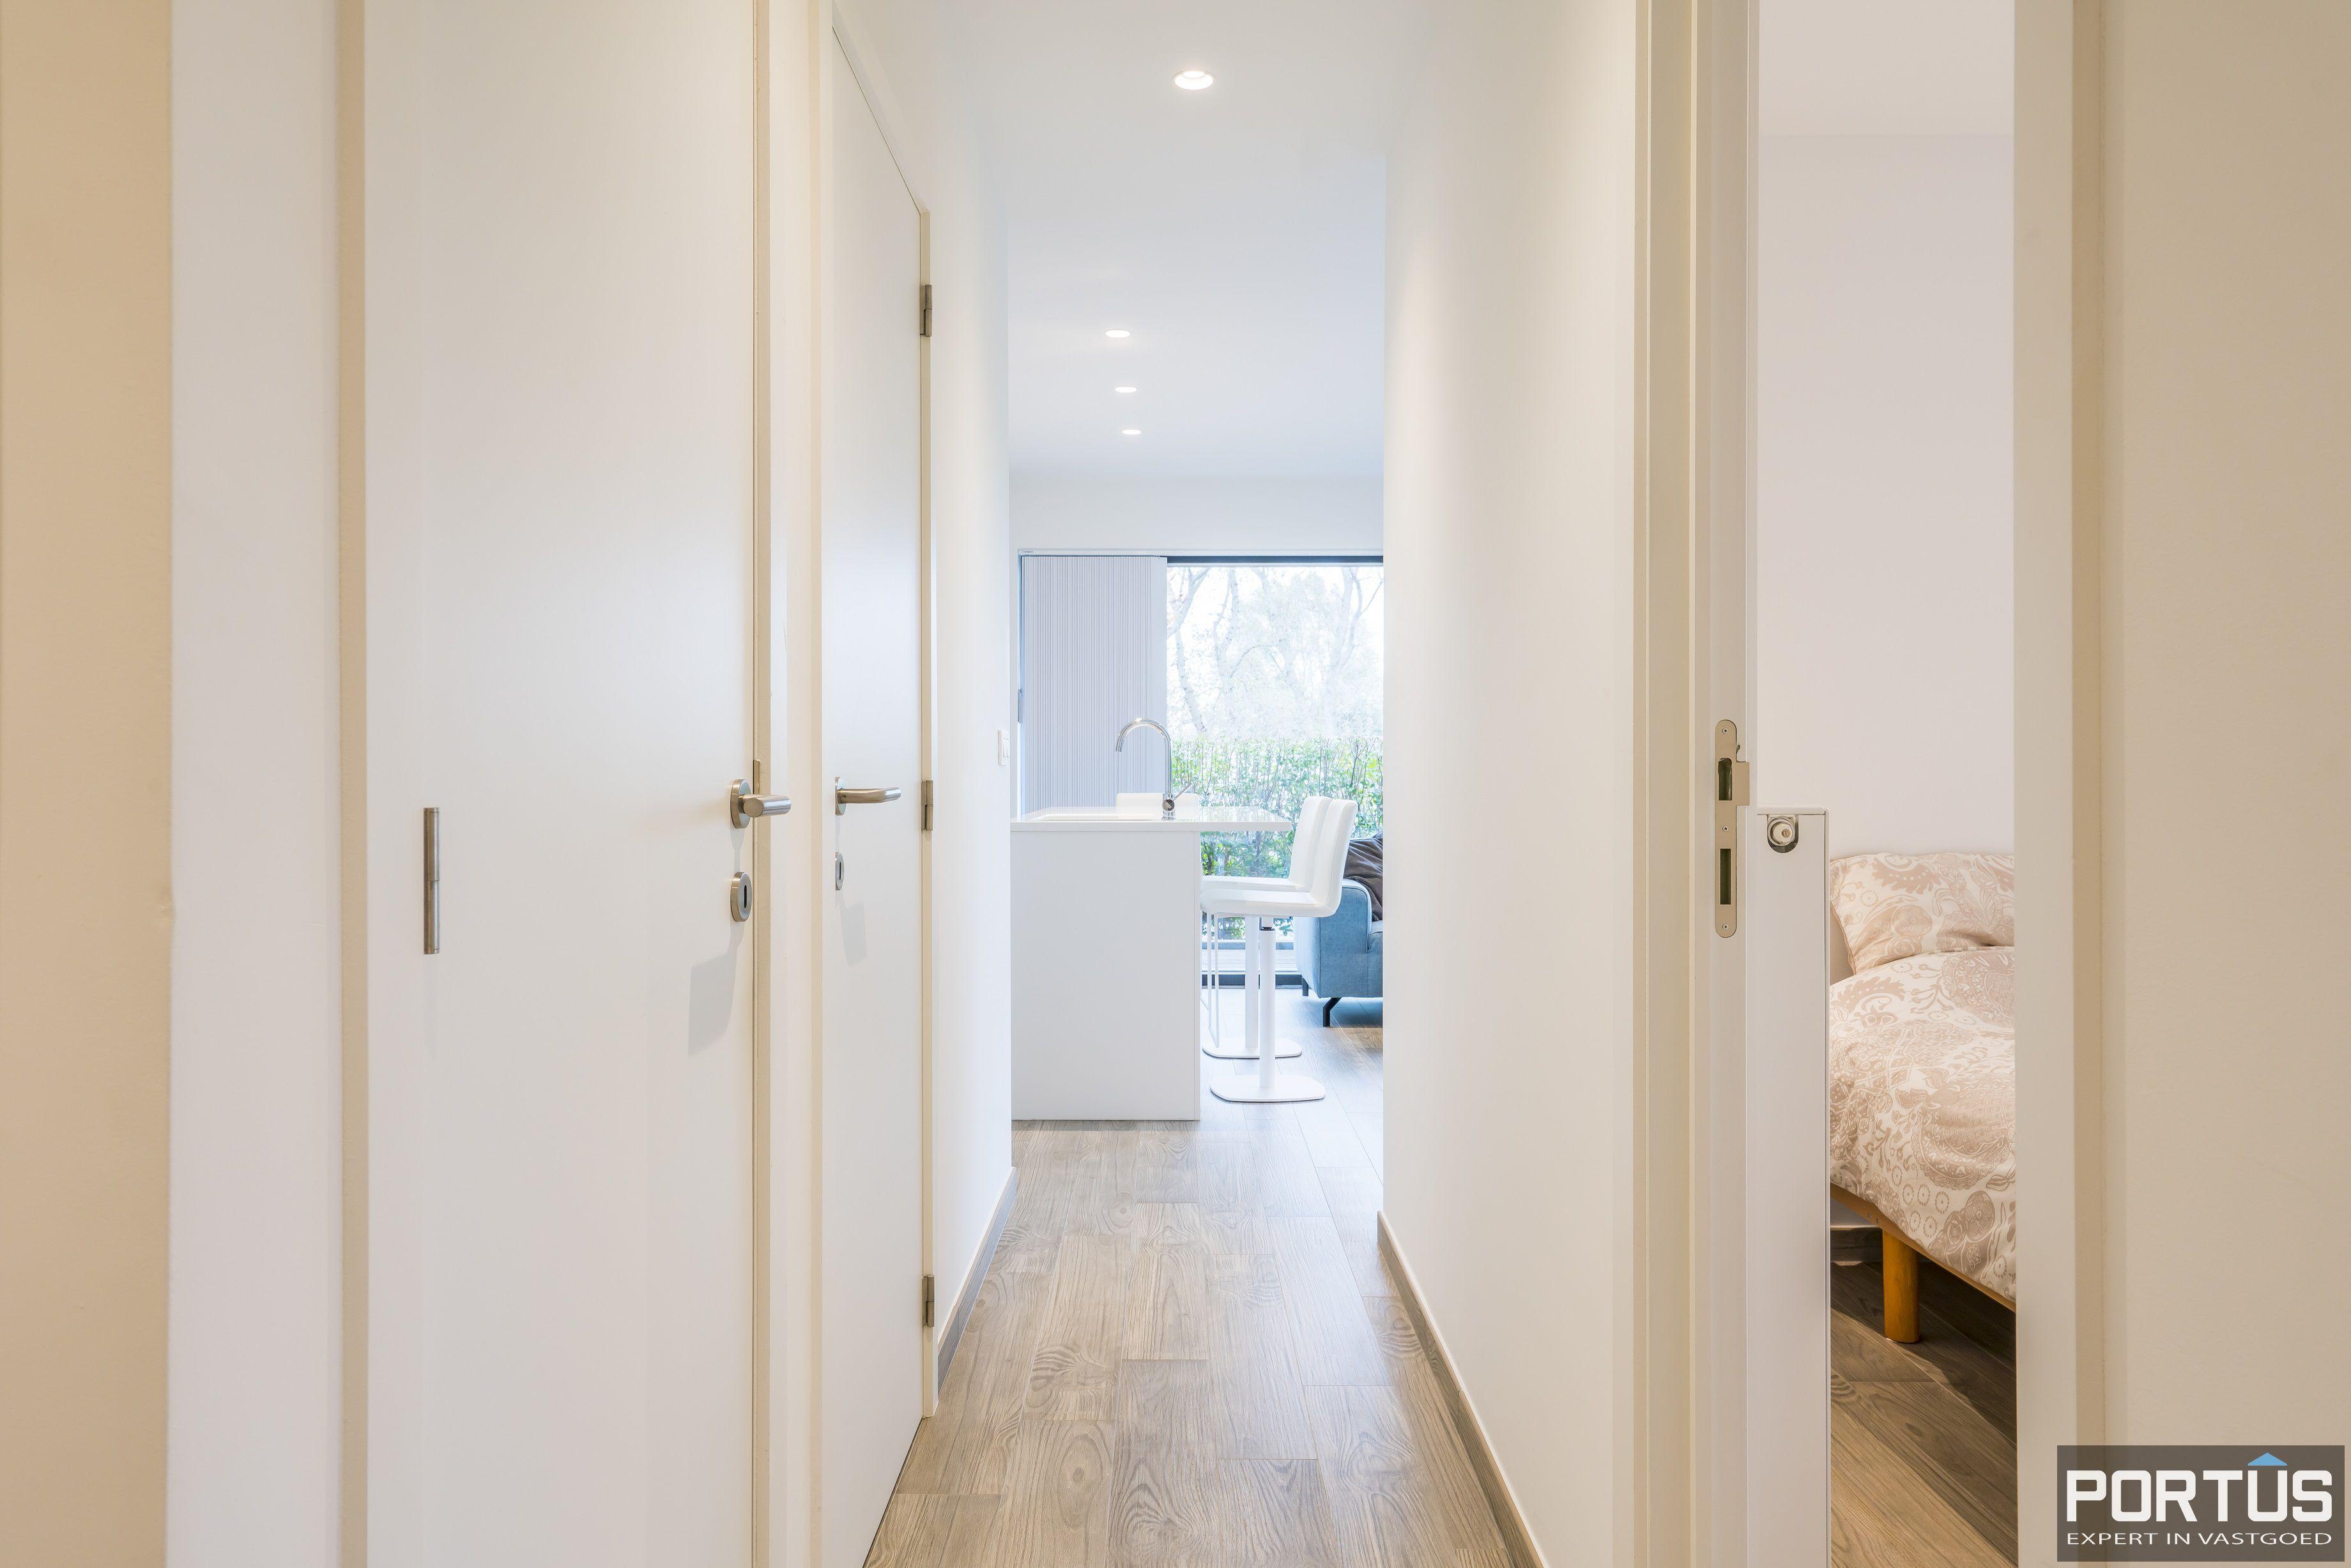 Appartement te koop met 2 slaapkamers in Residentie Waterfront te Nieuwpoort - 11866